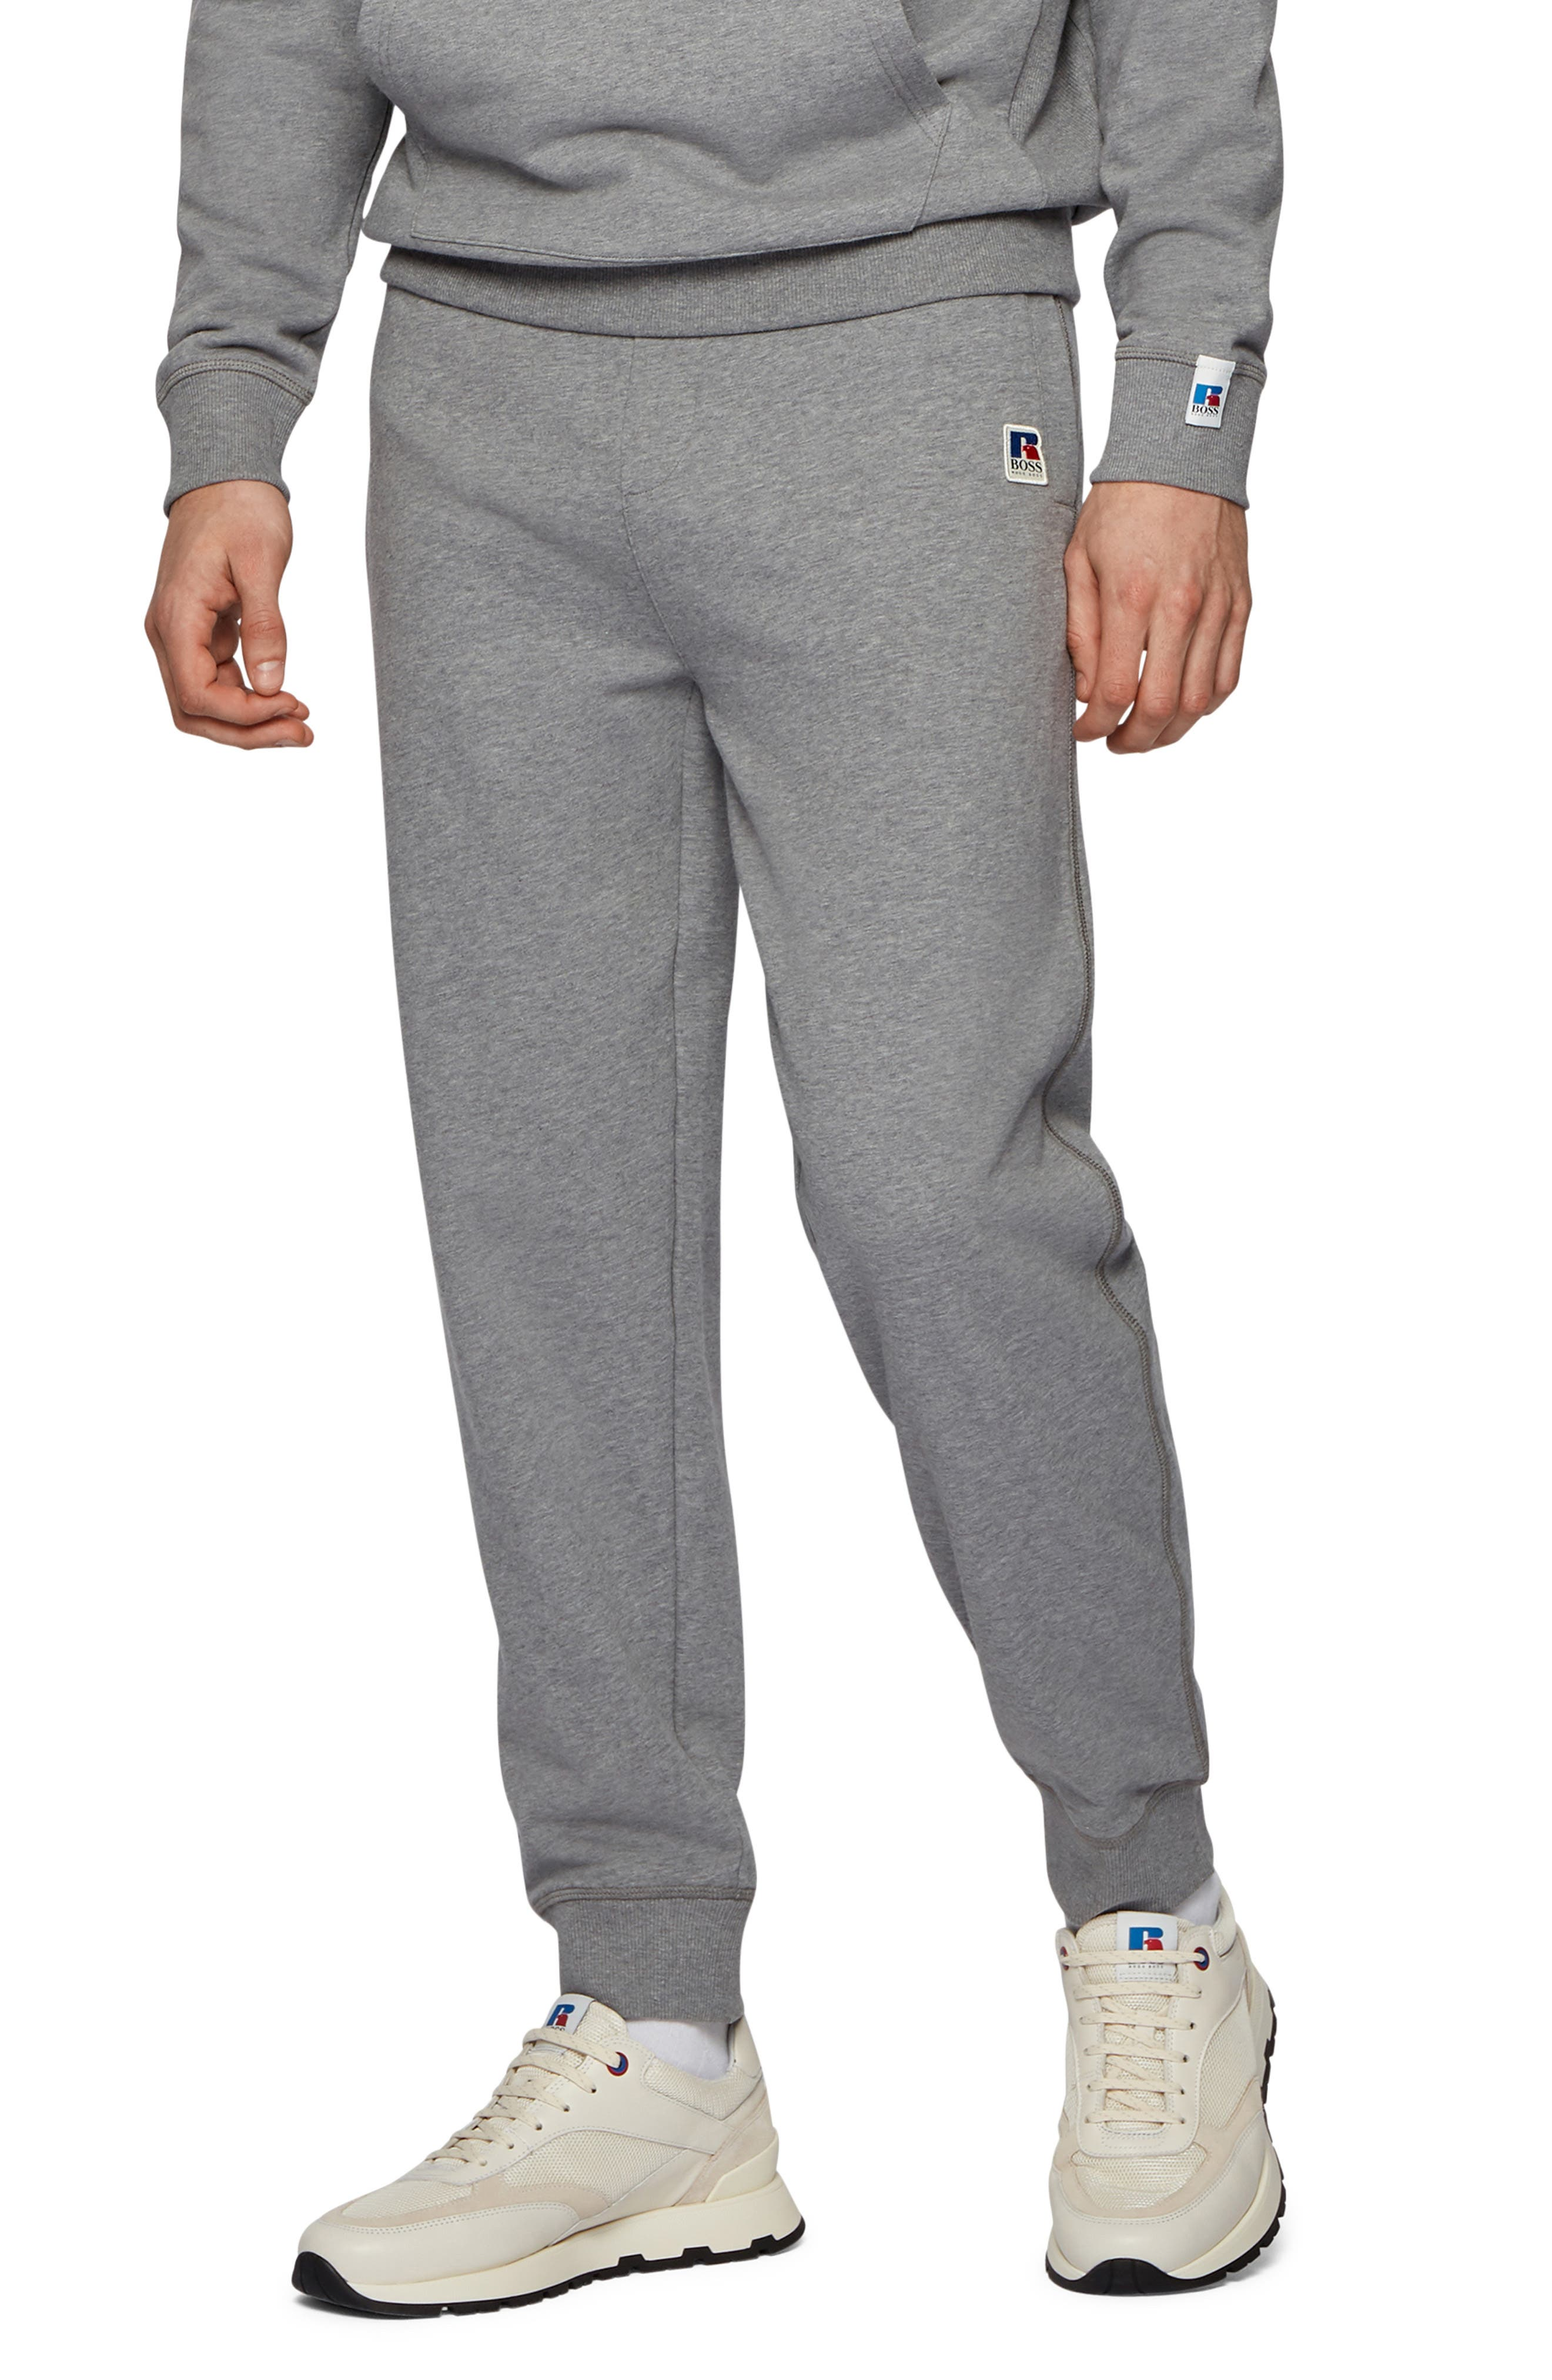 Boss x Russell Athletics Jafara Cotton Sweatpants